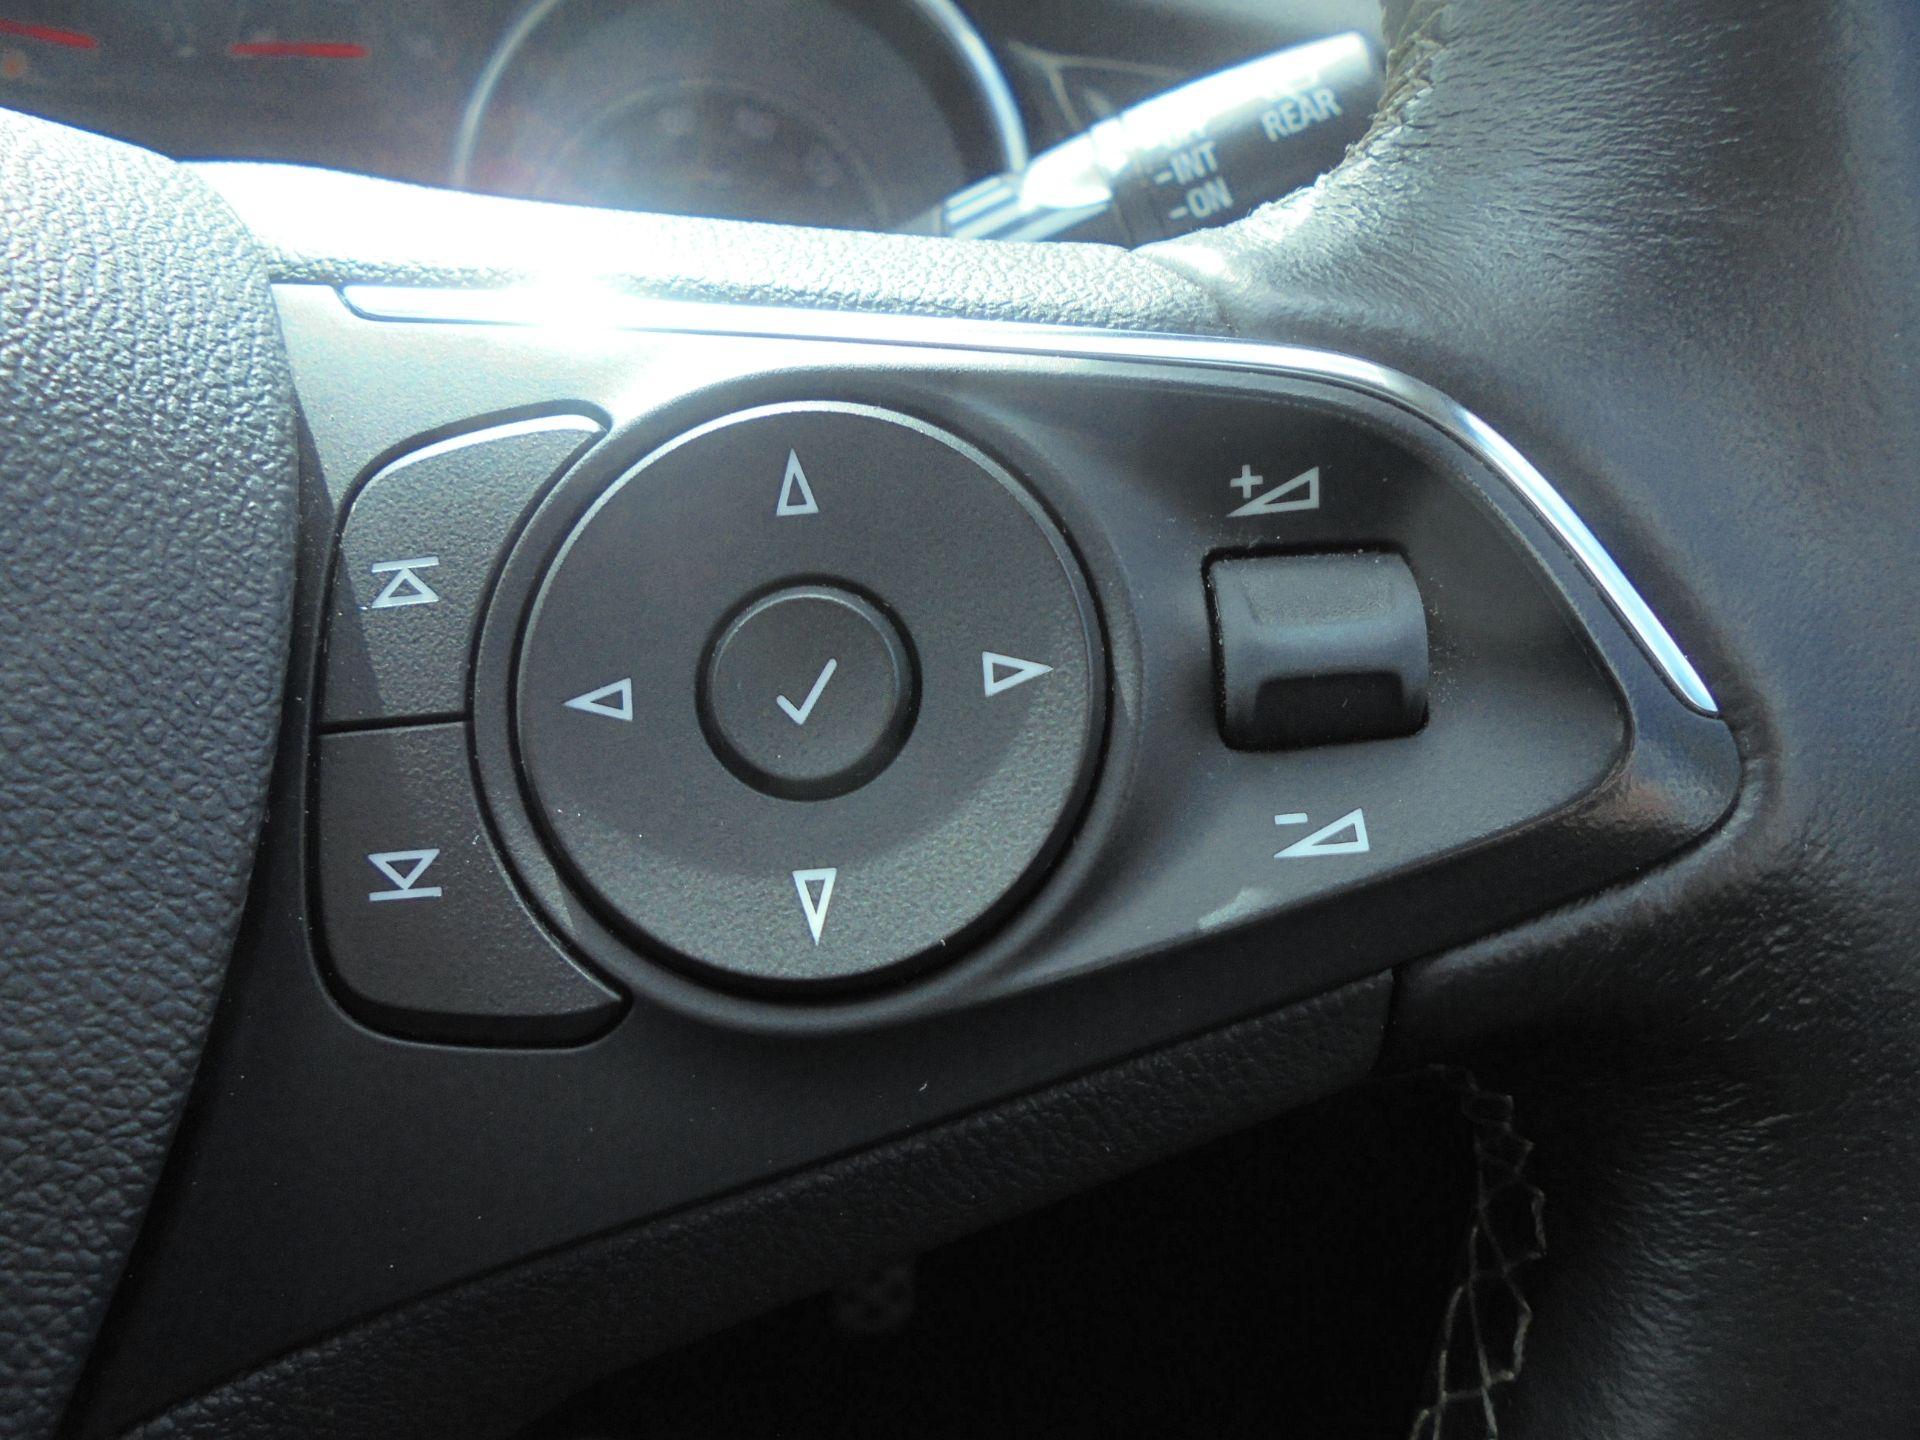 2018 Vauxhall Insignia Grand Sport 1.6 Turbo D Ecotec [136] Sri Nav 5Dr (VU18DFF) Image 15